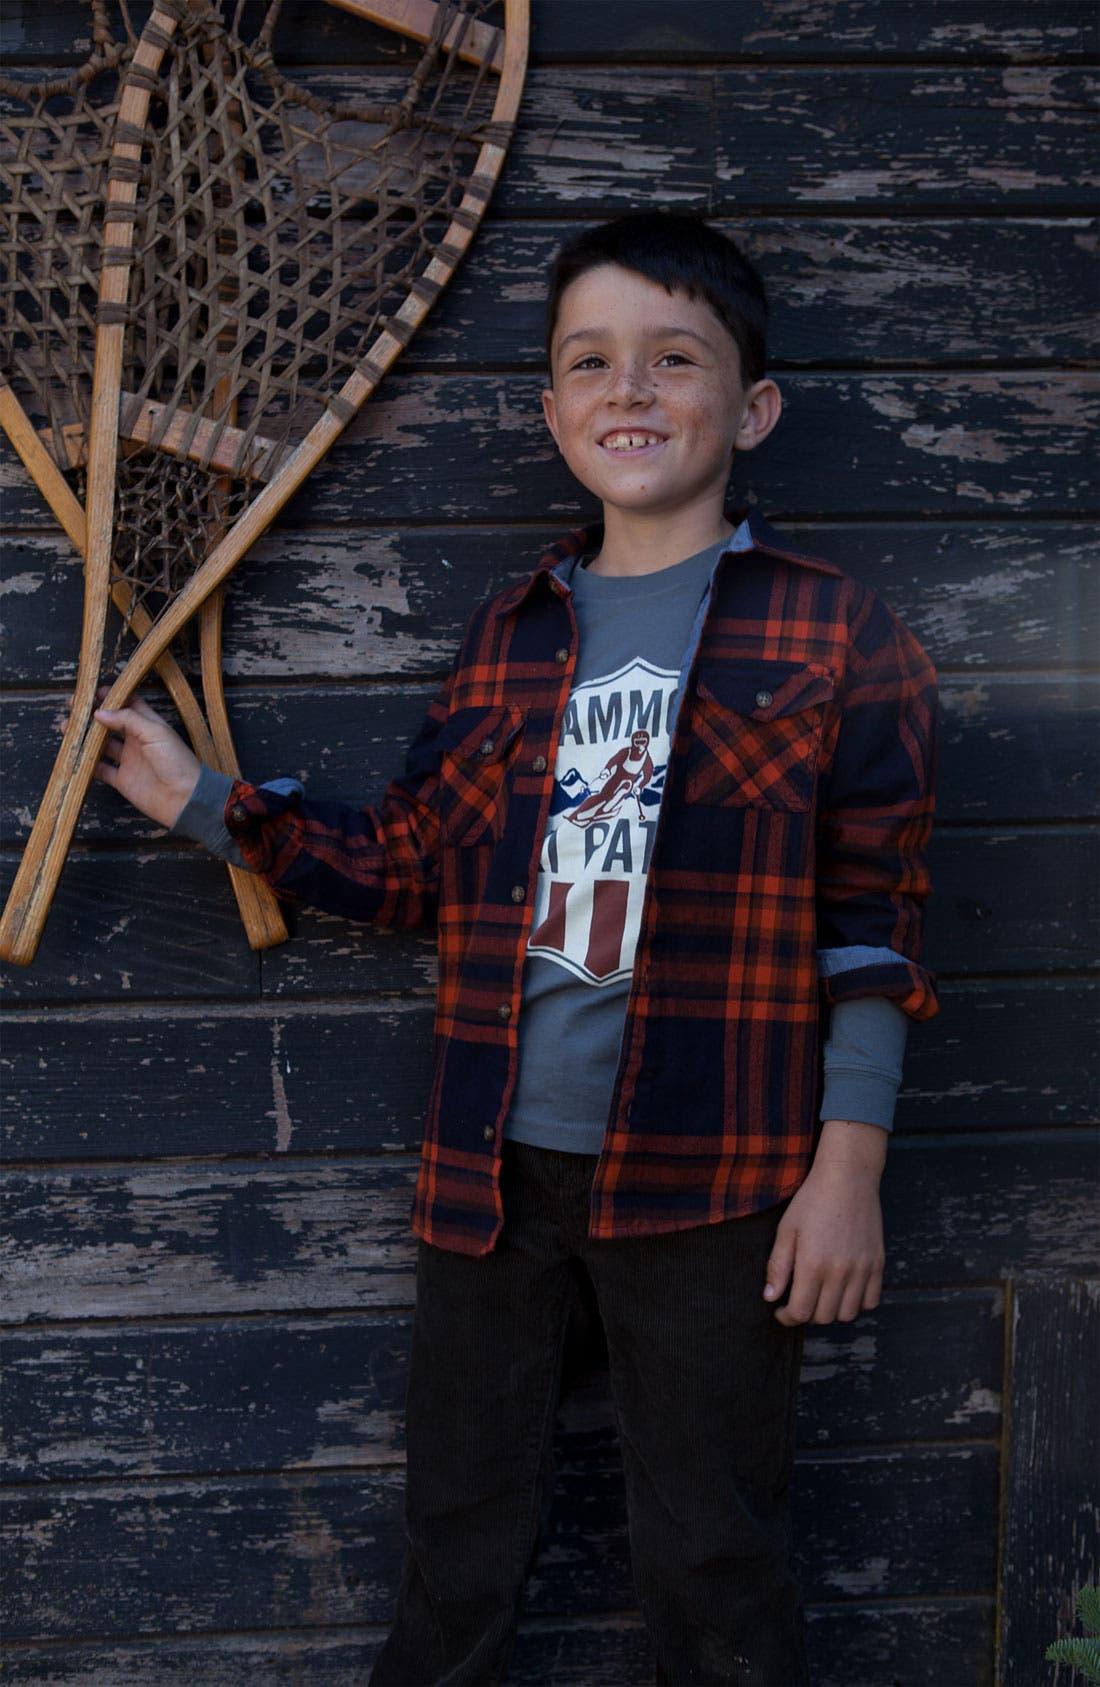 Alternate Image 2  - Peek 'Mammoth Ski Patrol' T-Shirt (Toddler, Little Boys & Big Boys)